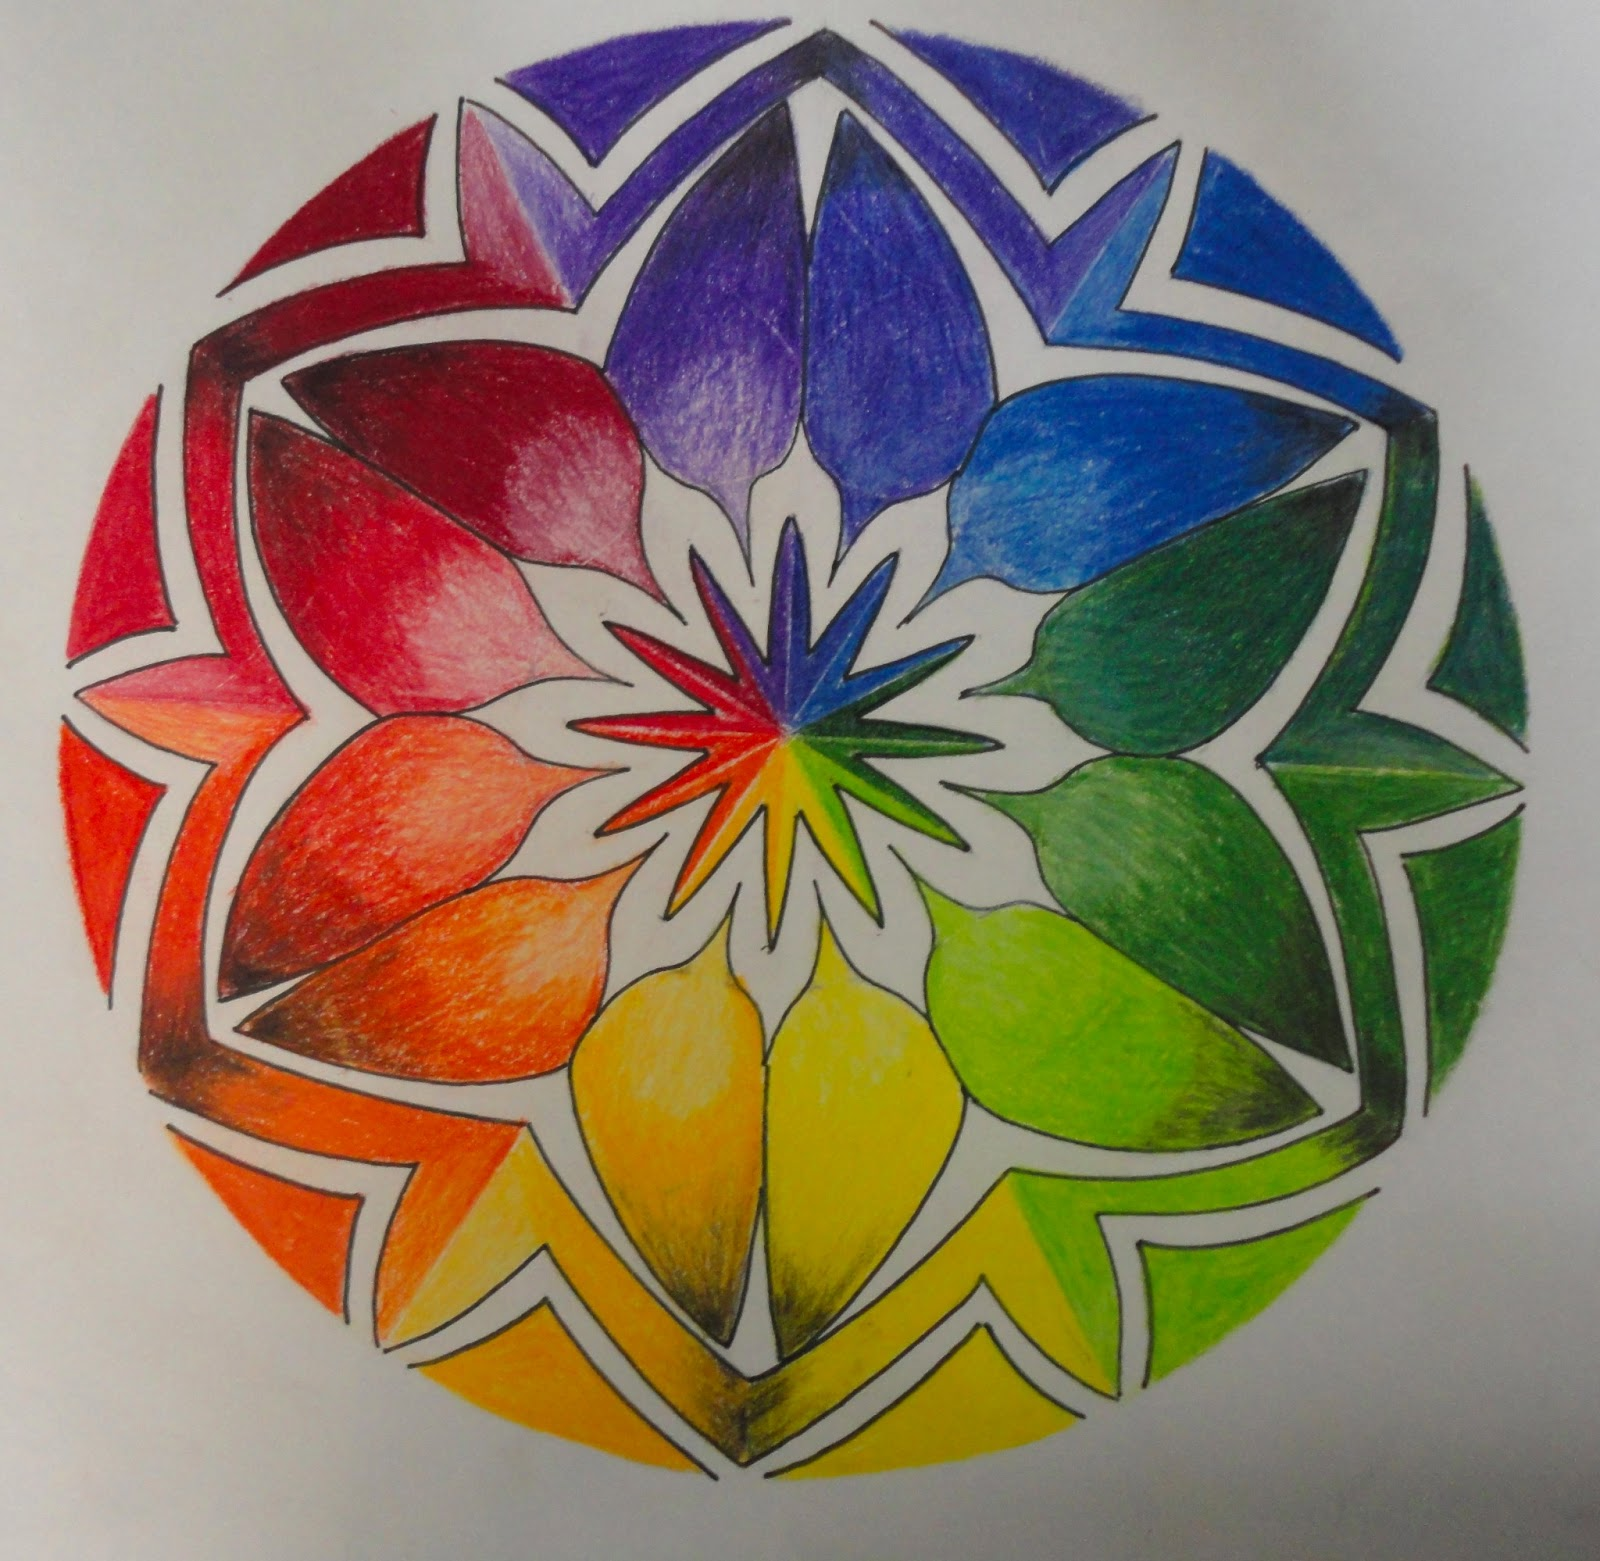 J rae designs - Color wheel for decorating ...